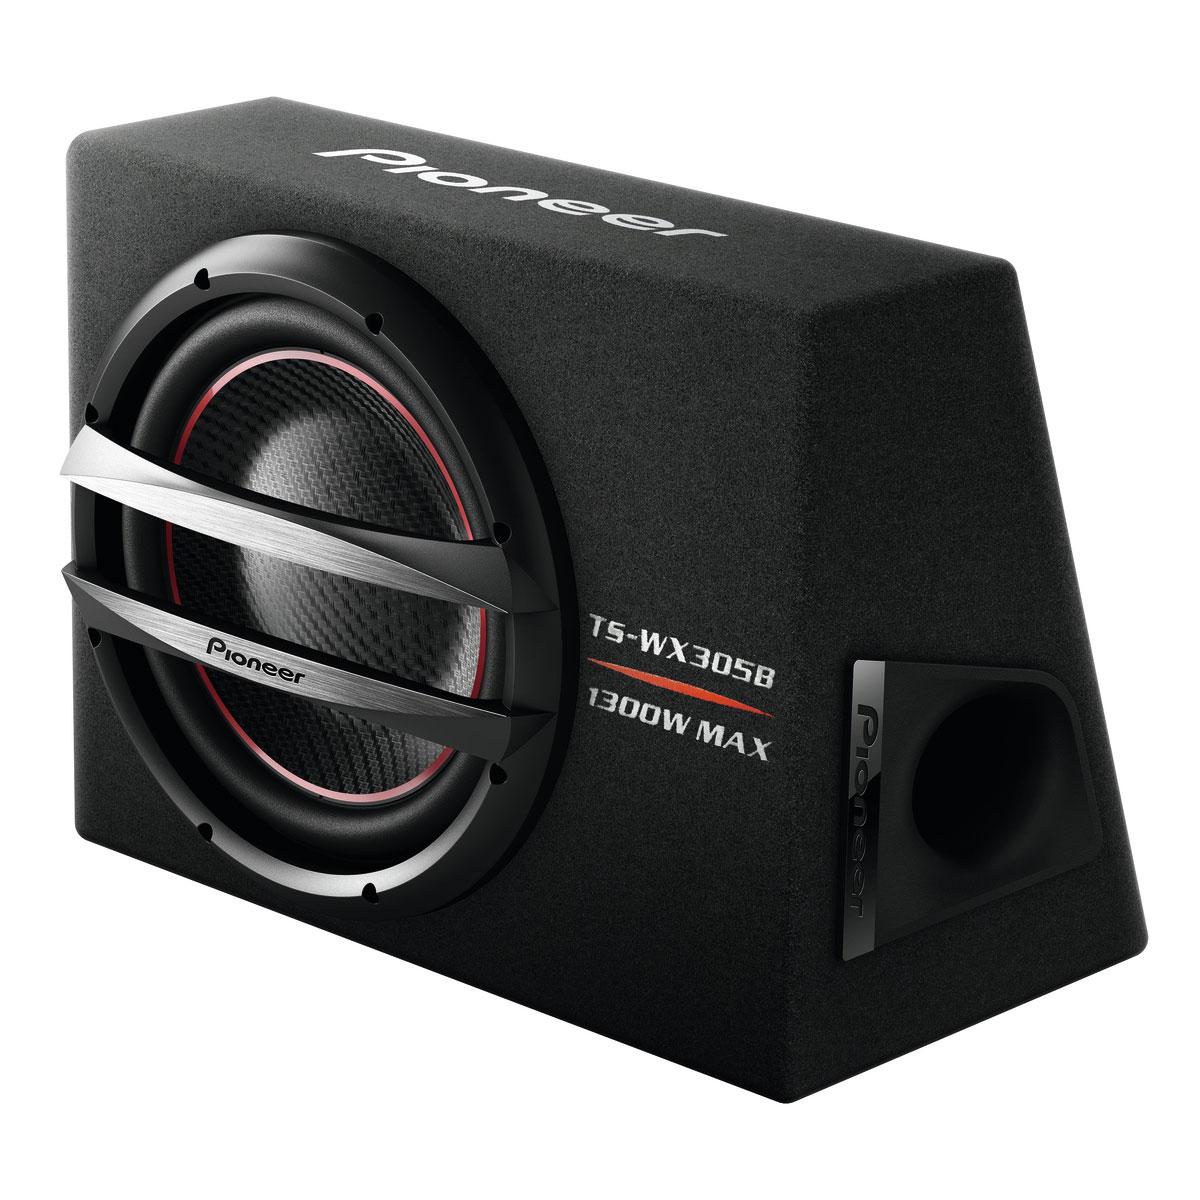 pioneer ts wx305b ts wx305b achat vente enceintes auto sur. Black Bedroom Furniture Sets. Home Design Ideas